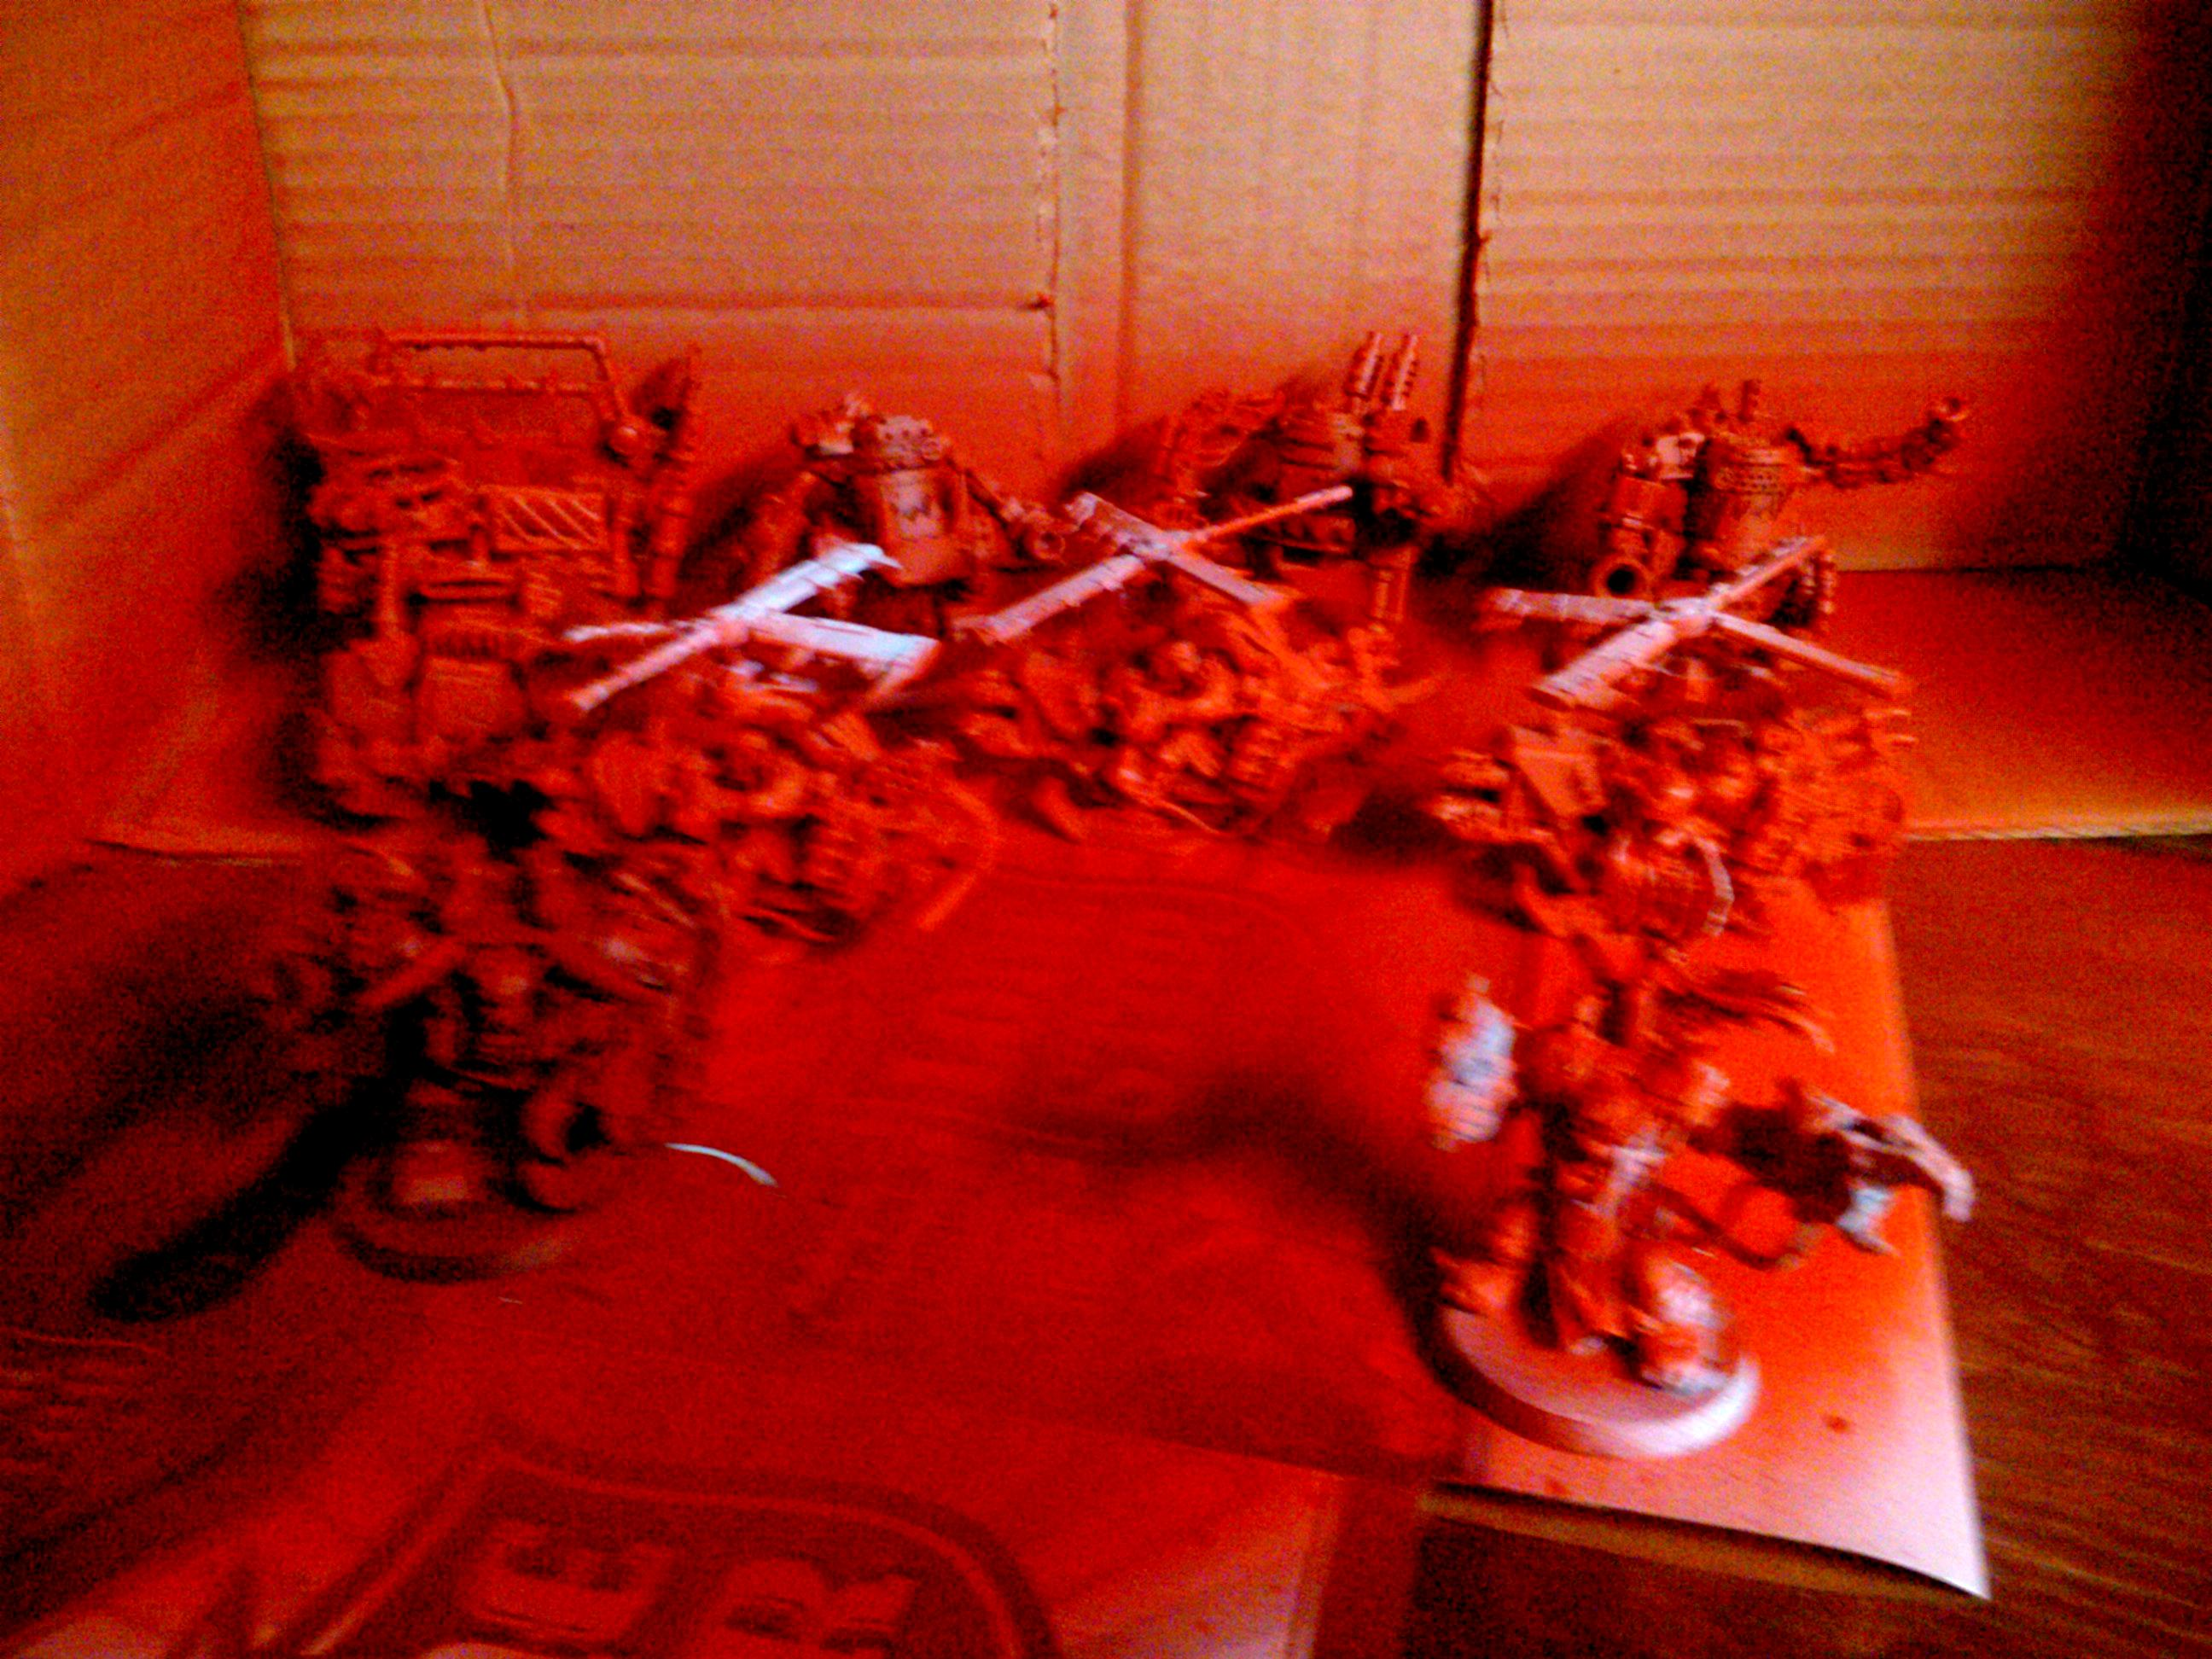 Army, Boss, Boy, Colour Scheme, Commission, Conversion, Dreadz, Hobby, Mechs, Nob, Orcs, Ork Army, Orks, Painting, Project, Red, Scheme, Tankk, Trukk, Waaagh, Waagh